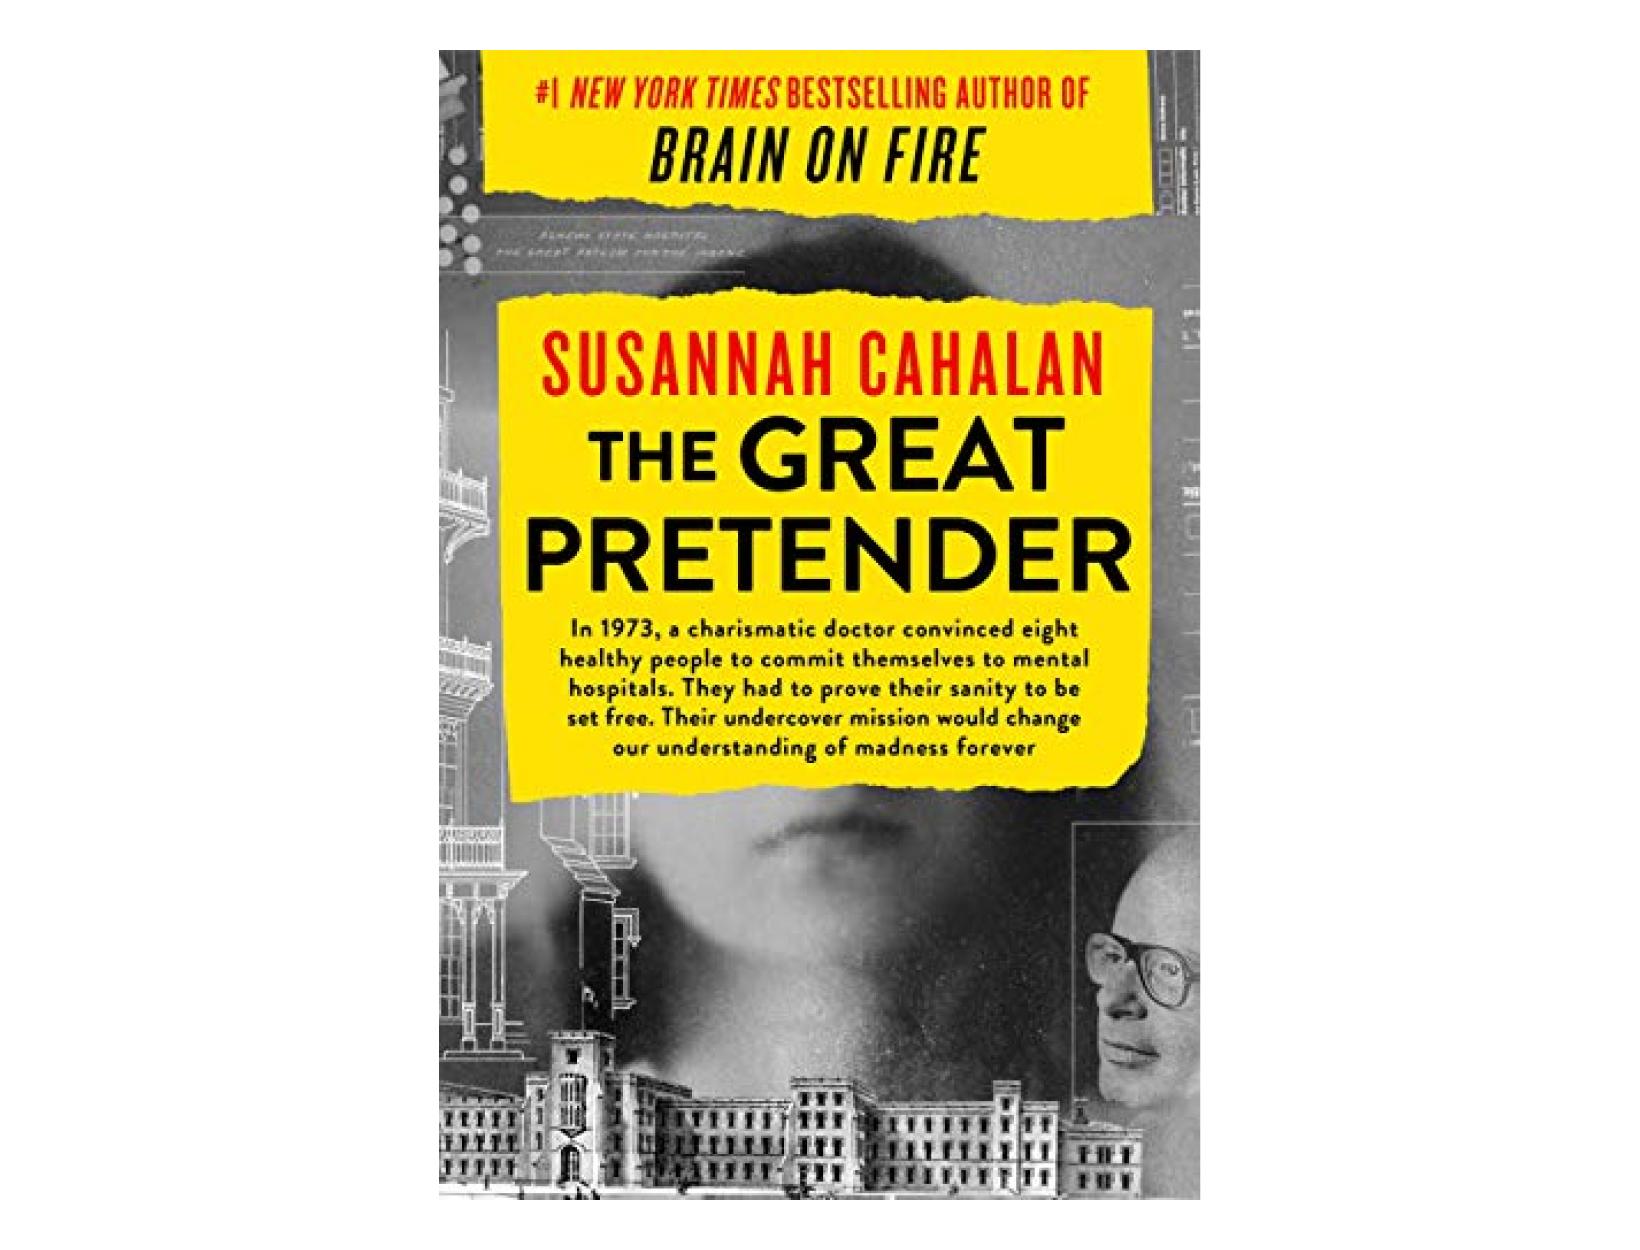 <em>The Great Pretender</em> by SusannahCahalan